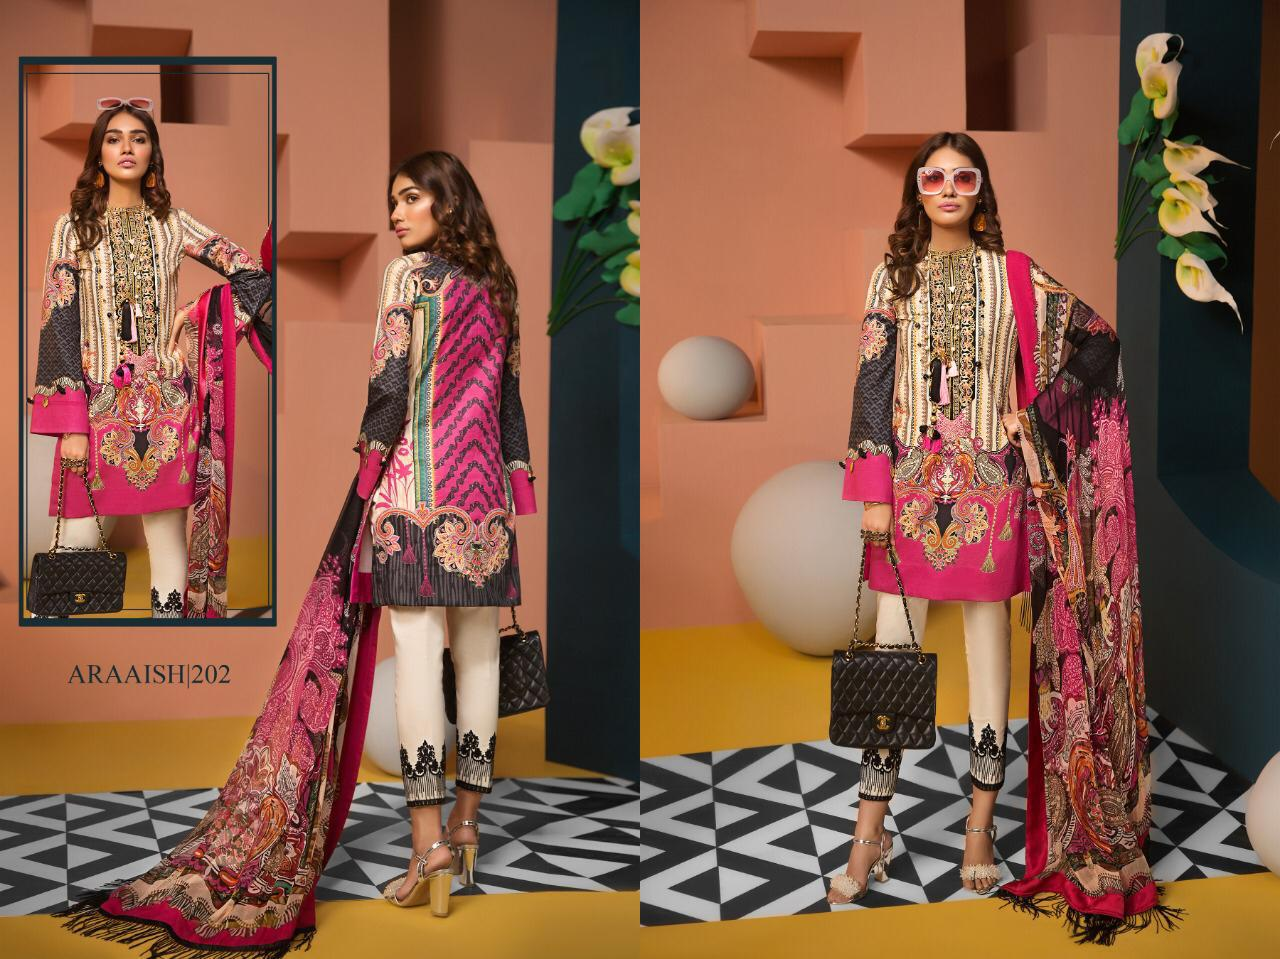 Araaish Vol 2 Designer Lawn Print & Heavy Embroidery Suits Wholesale